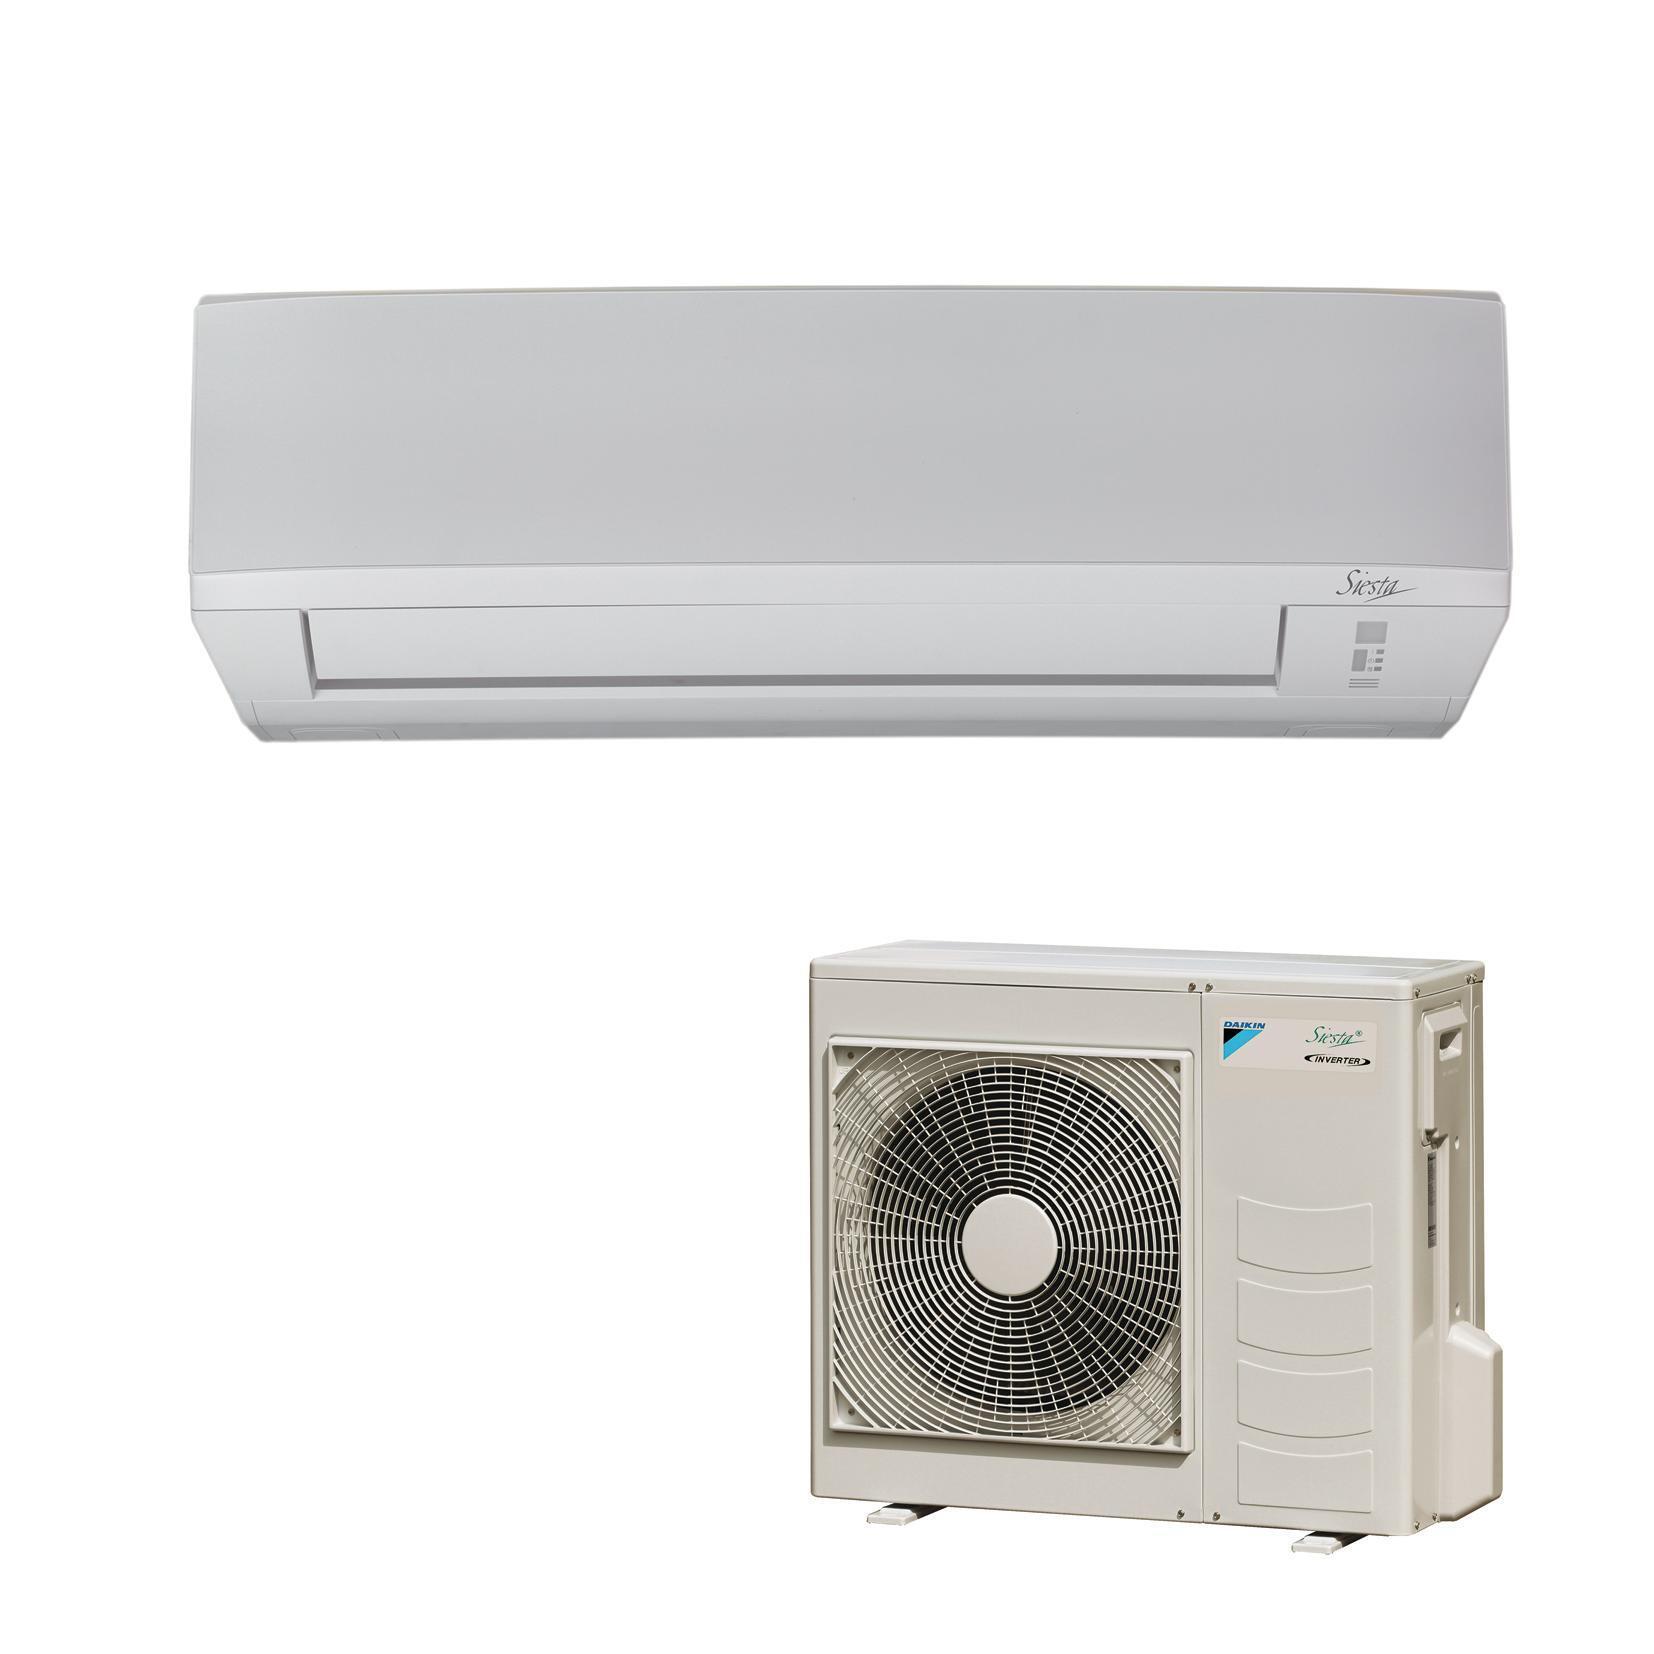 Climatizzatore monosplit DAIKIN ATXN35NB9 12000 BTU - 1